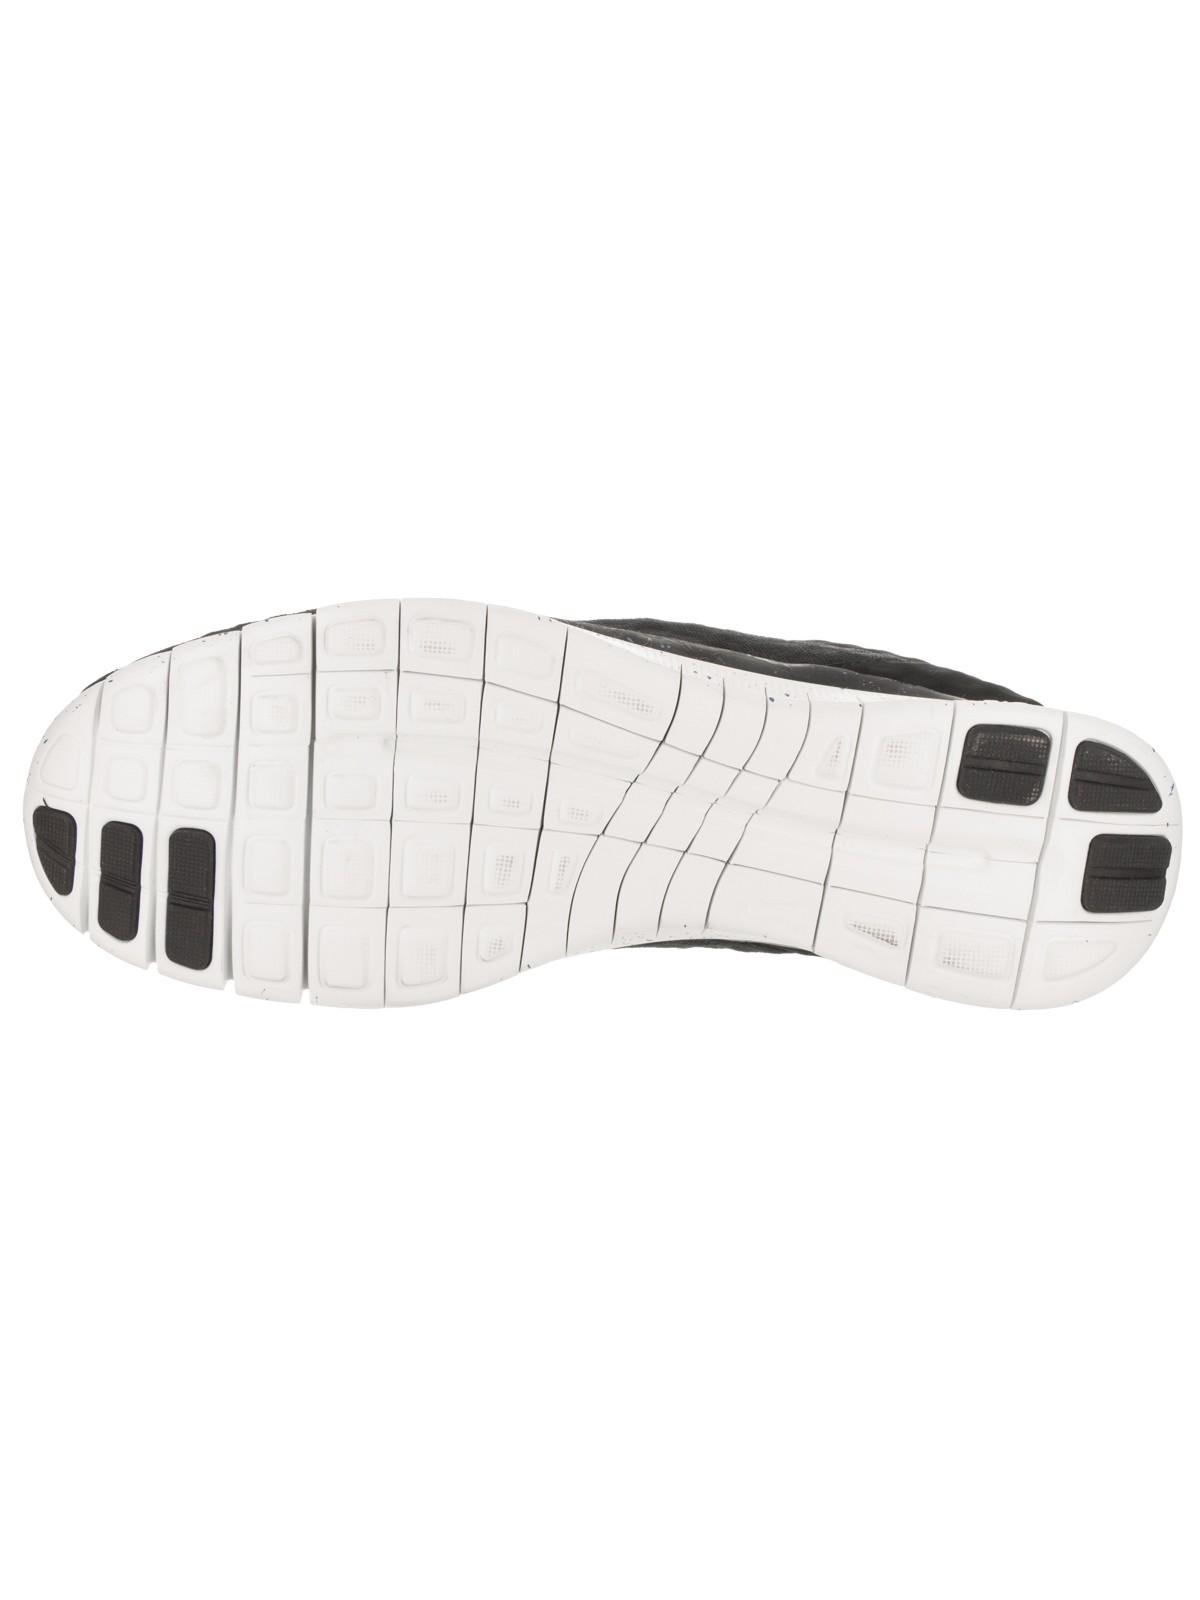 Nike Men's Free Hypervenom Low Training Shoe